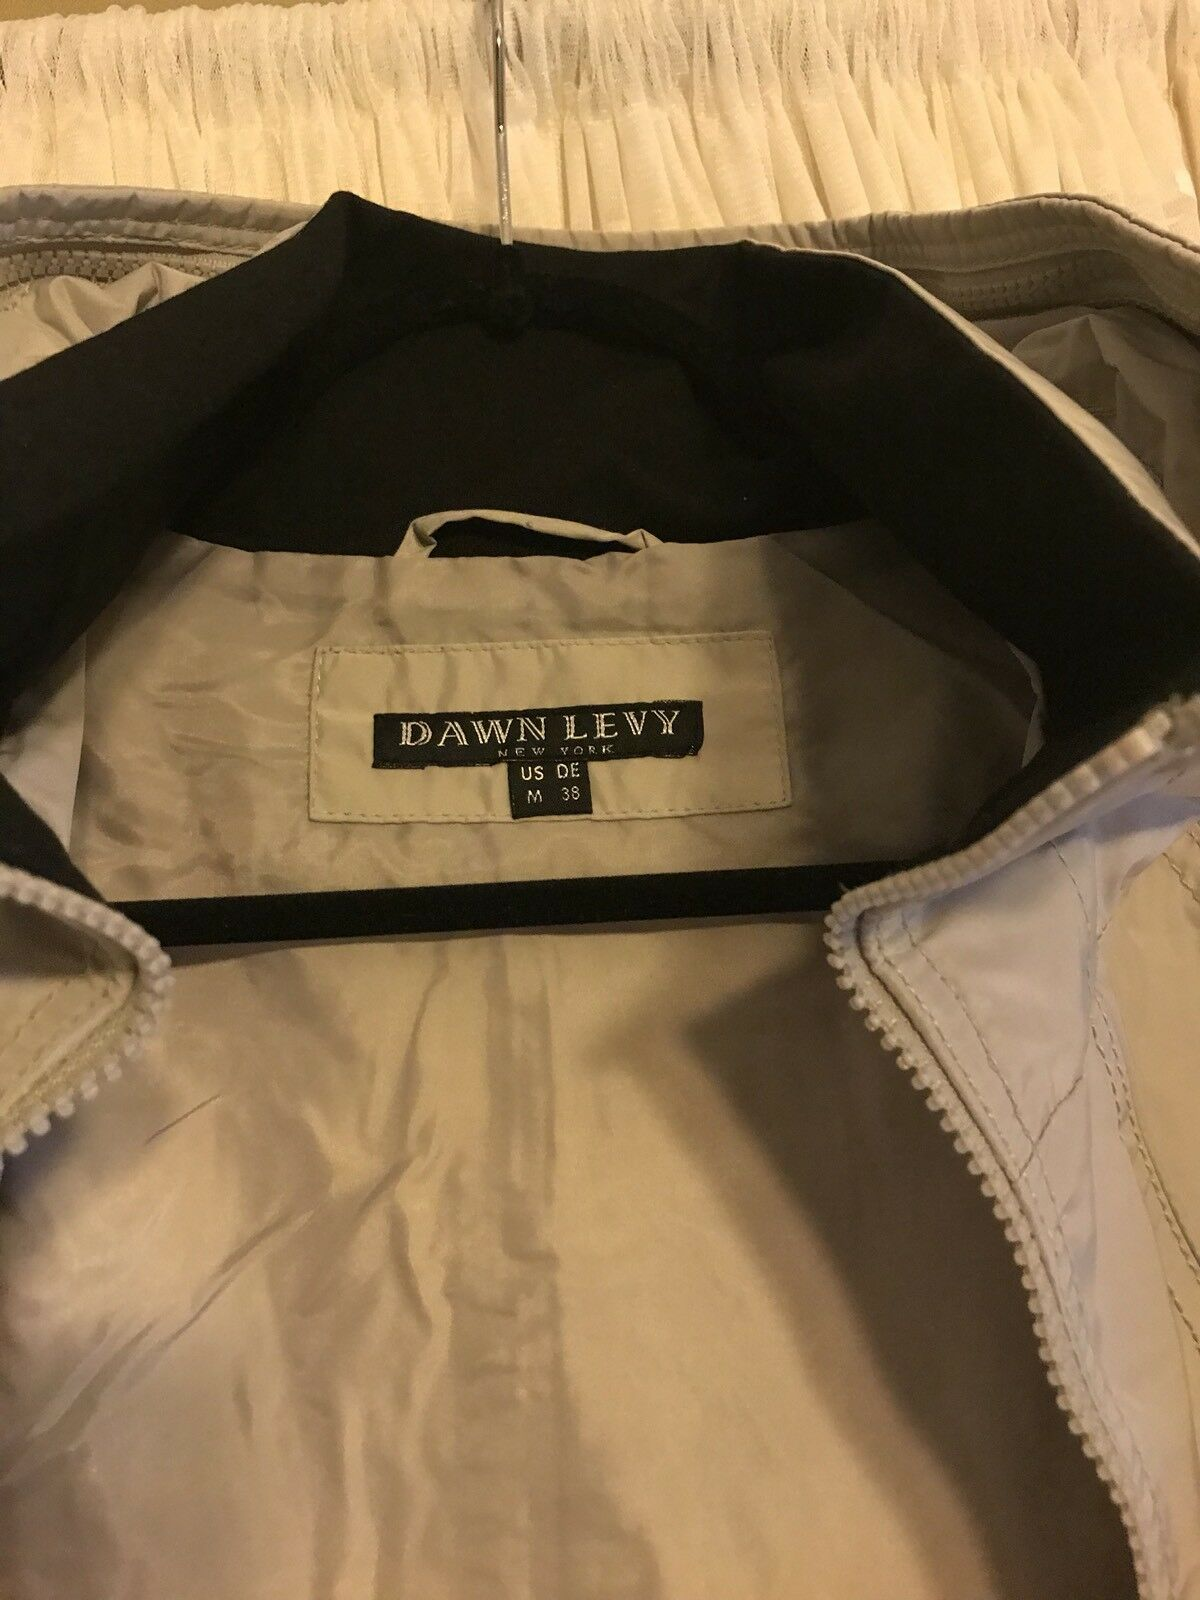 DOWN LEVY Women's Raincoat Raincoat Raincoat Size M NWOT b00631